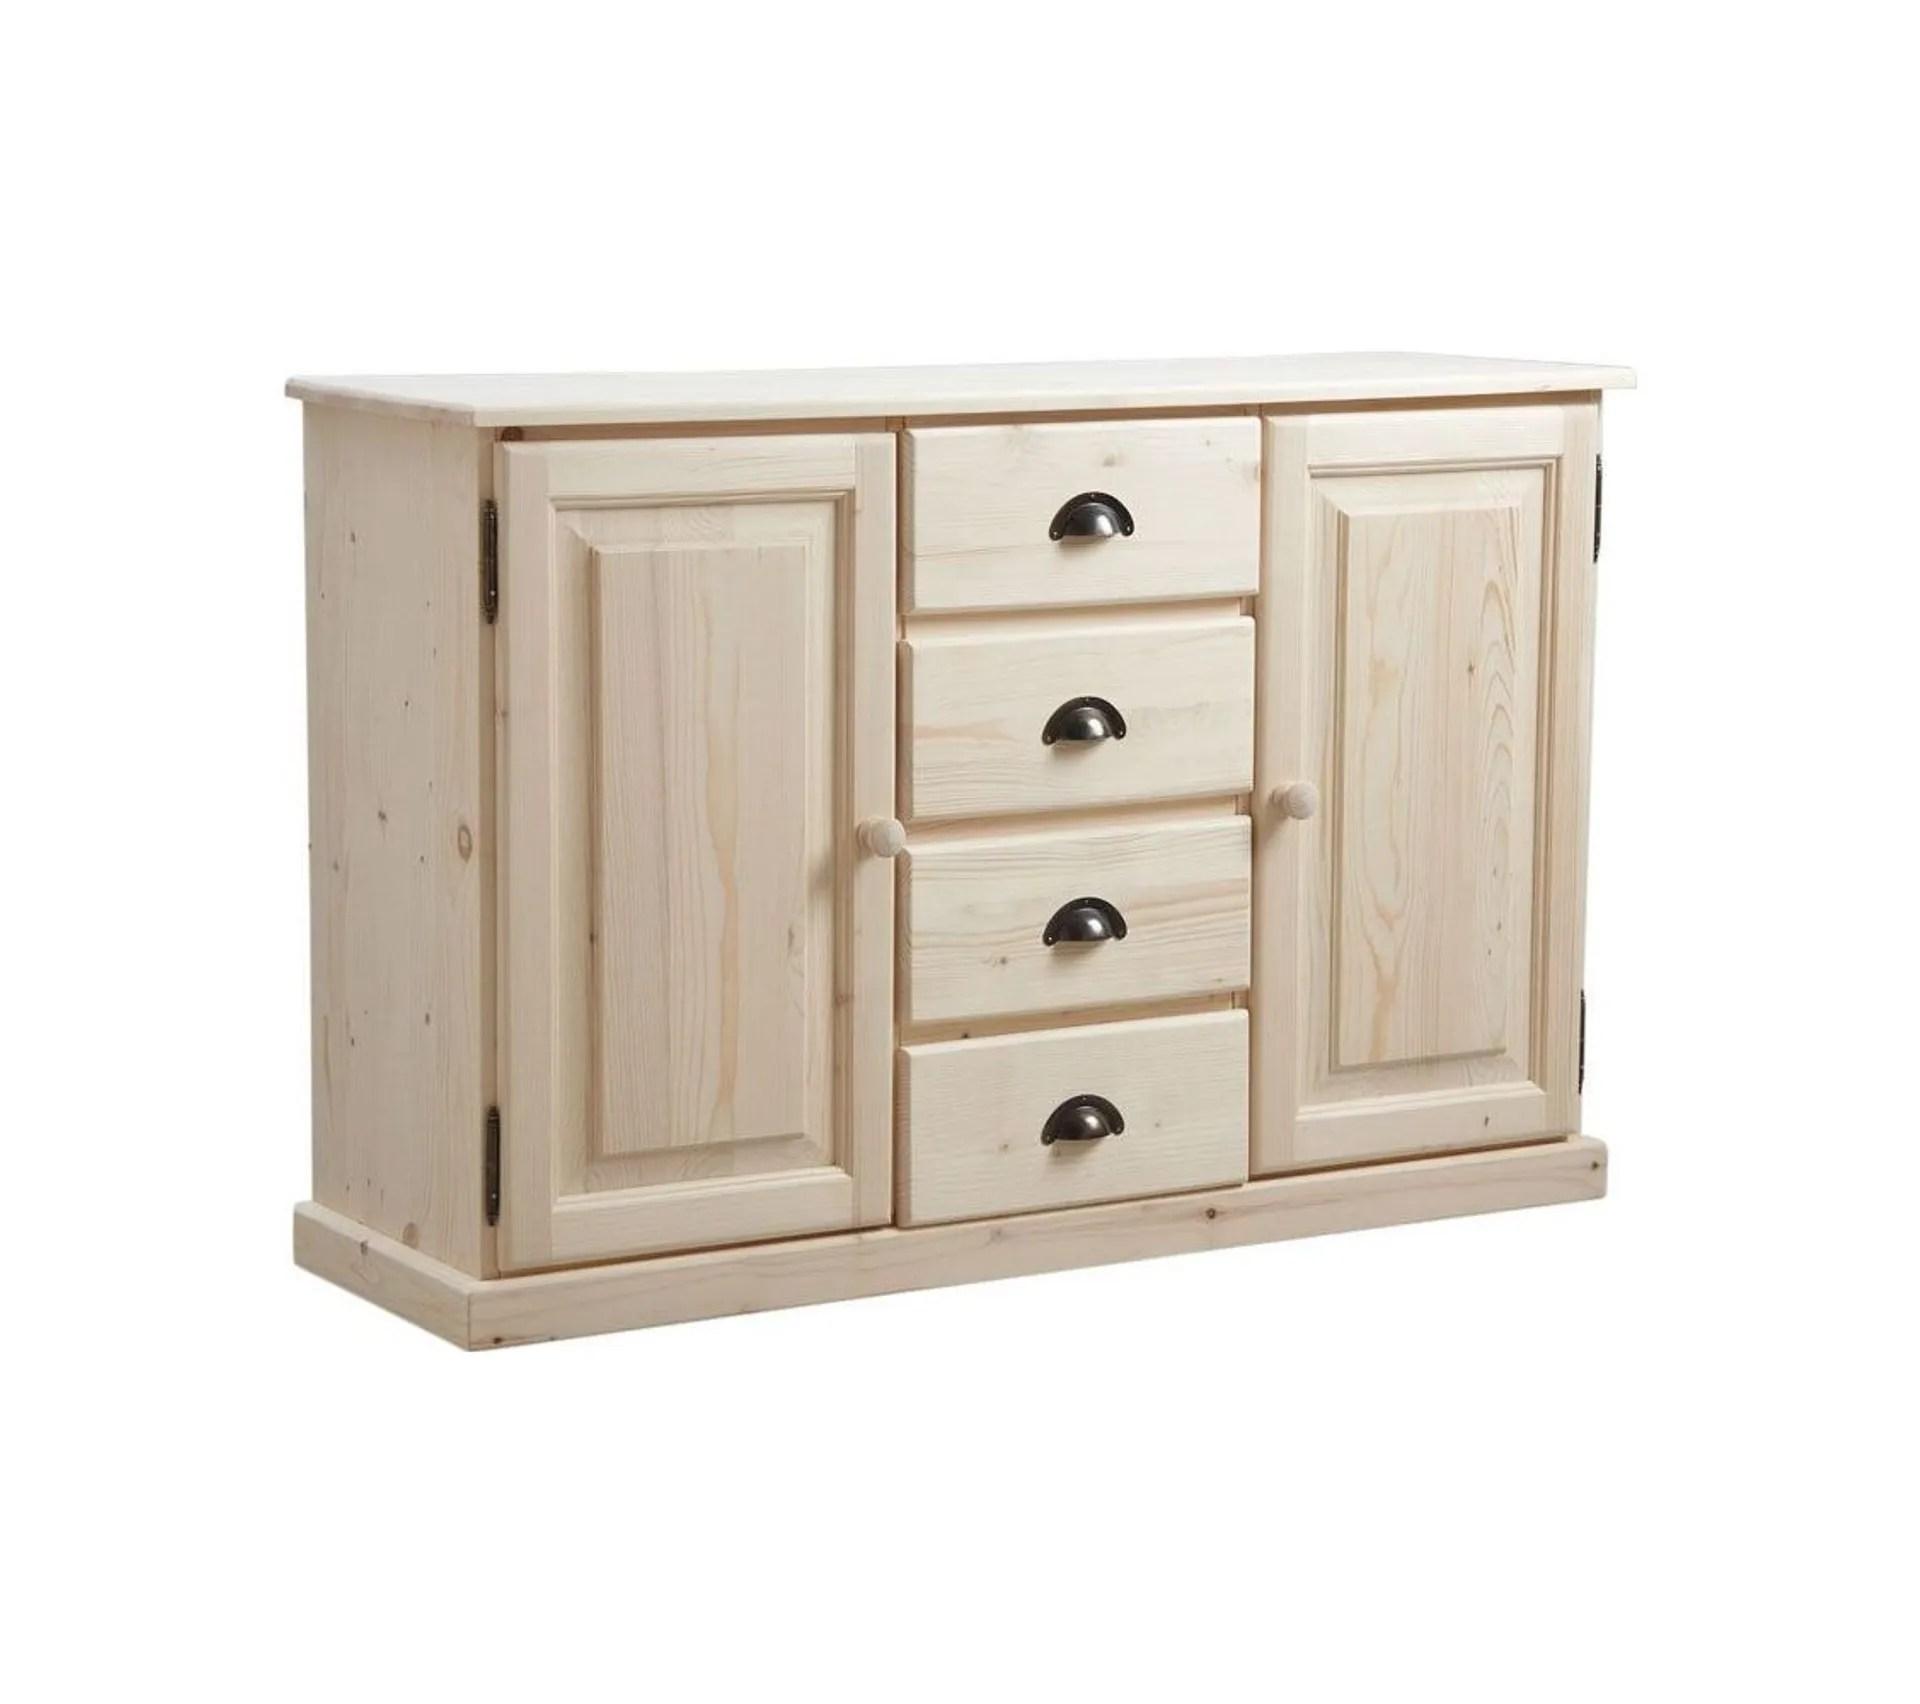 meuble bois brut 2 portes 4 tiroirs